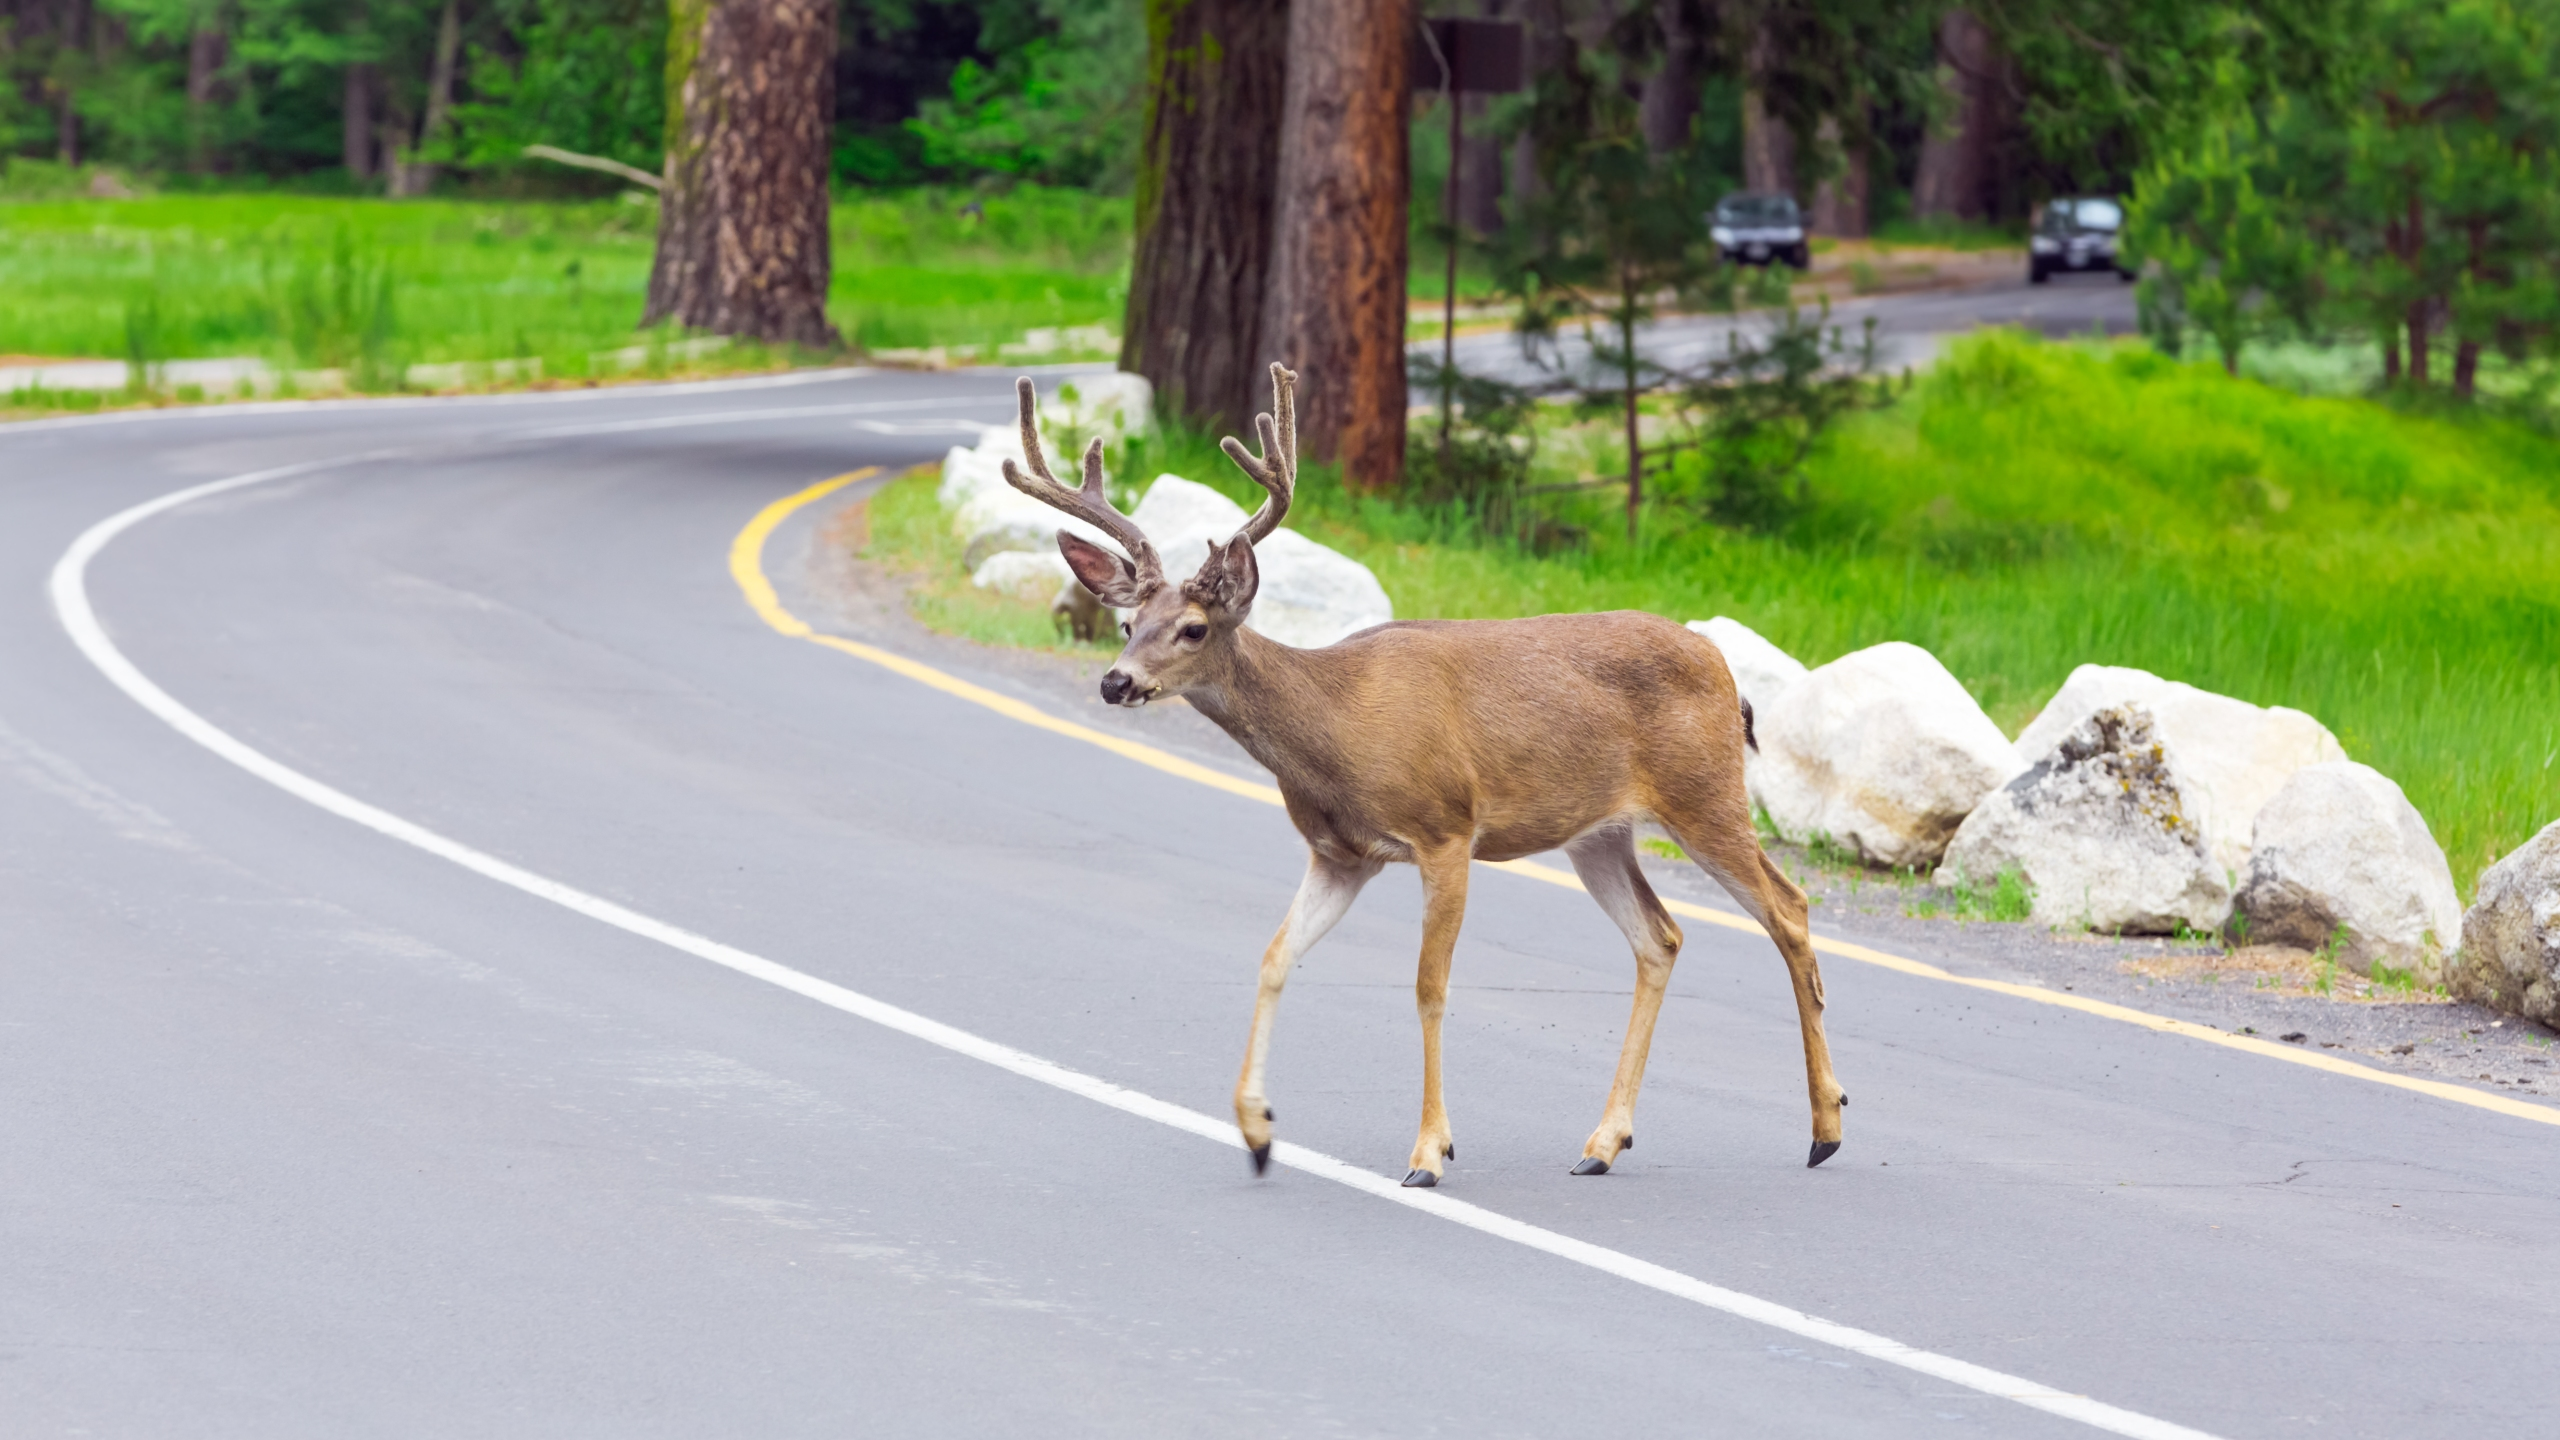 Deer on Indiana roads